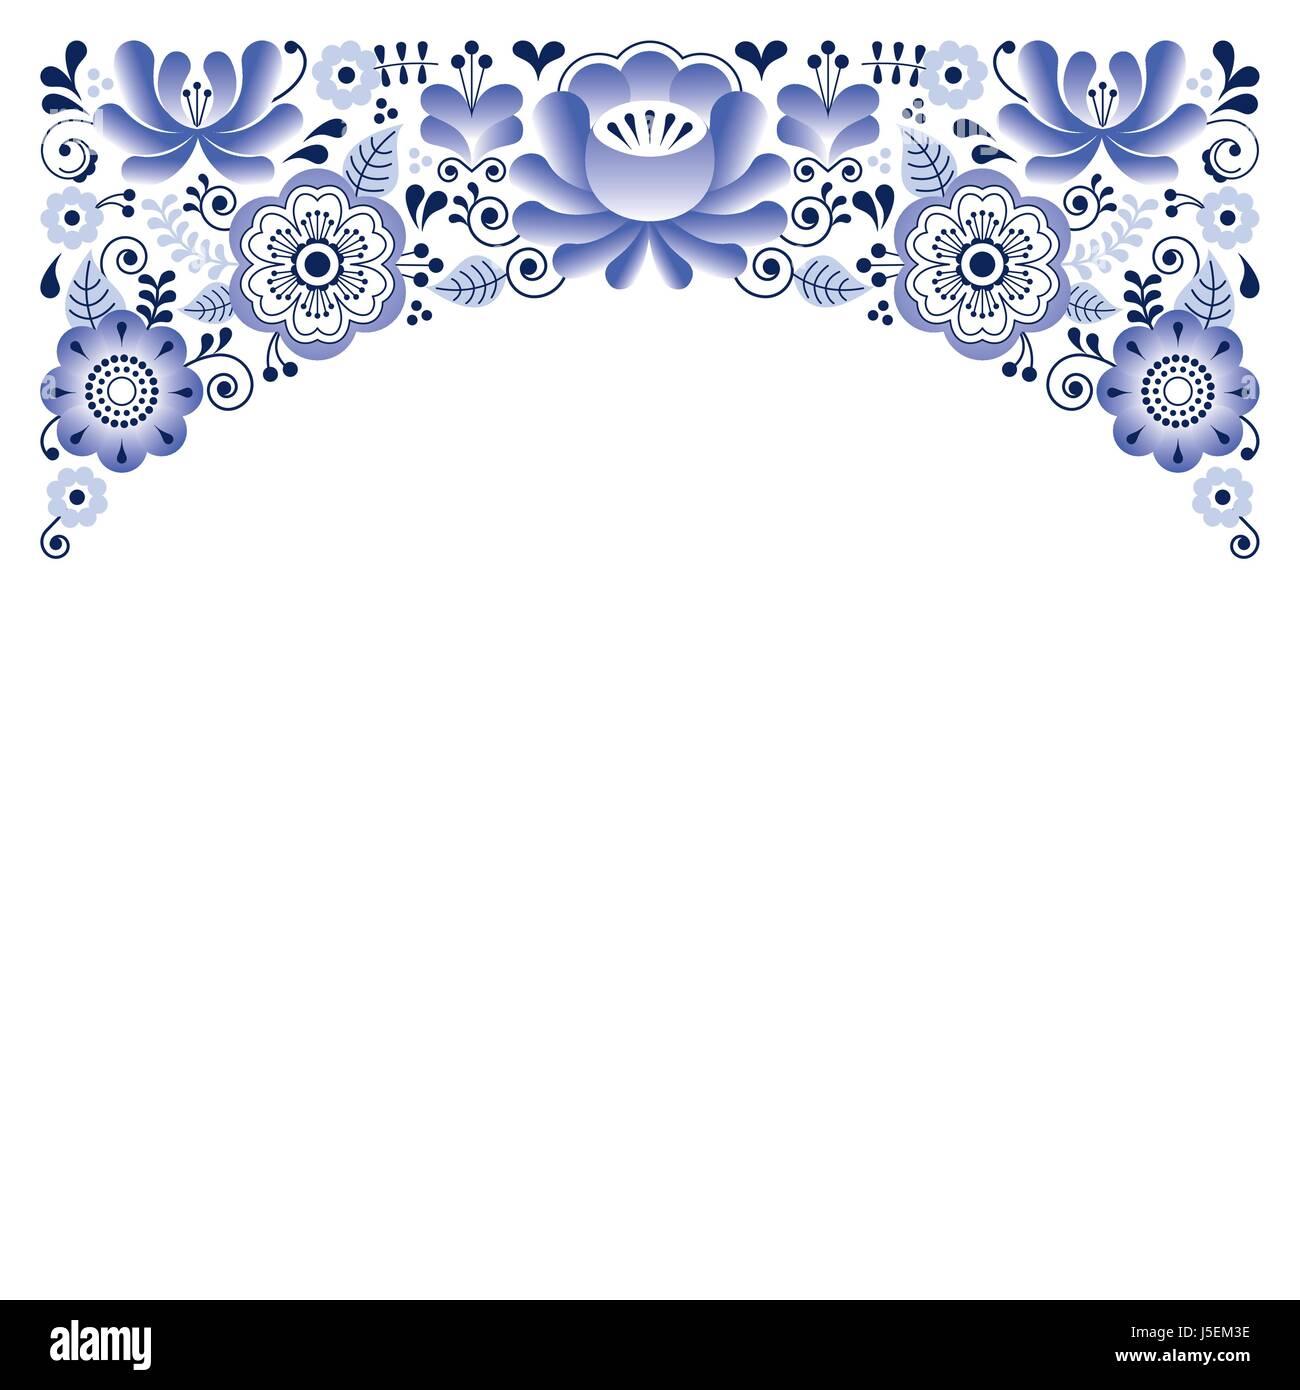 Russian floral ornament, Gzhel style - wedding invitation, greetings ...